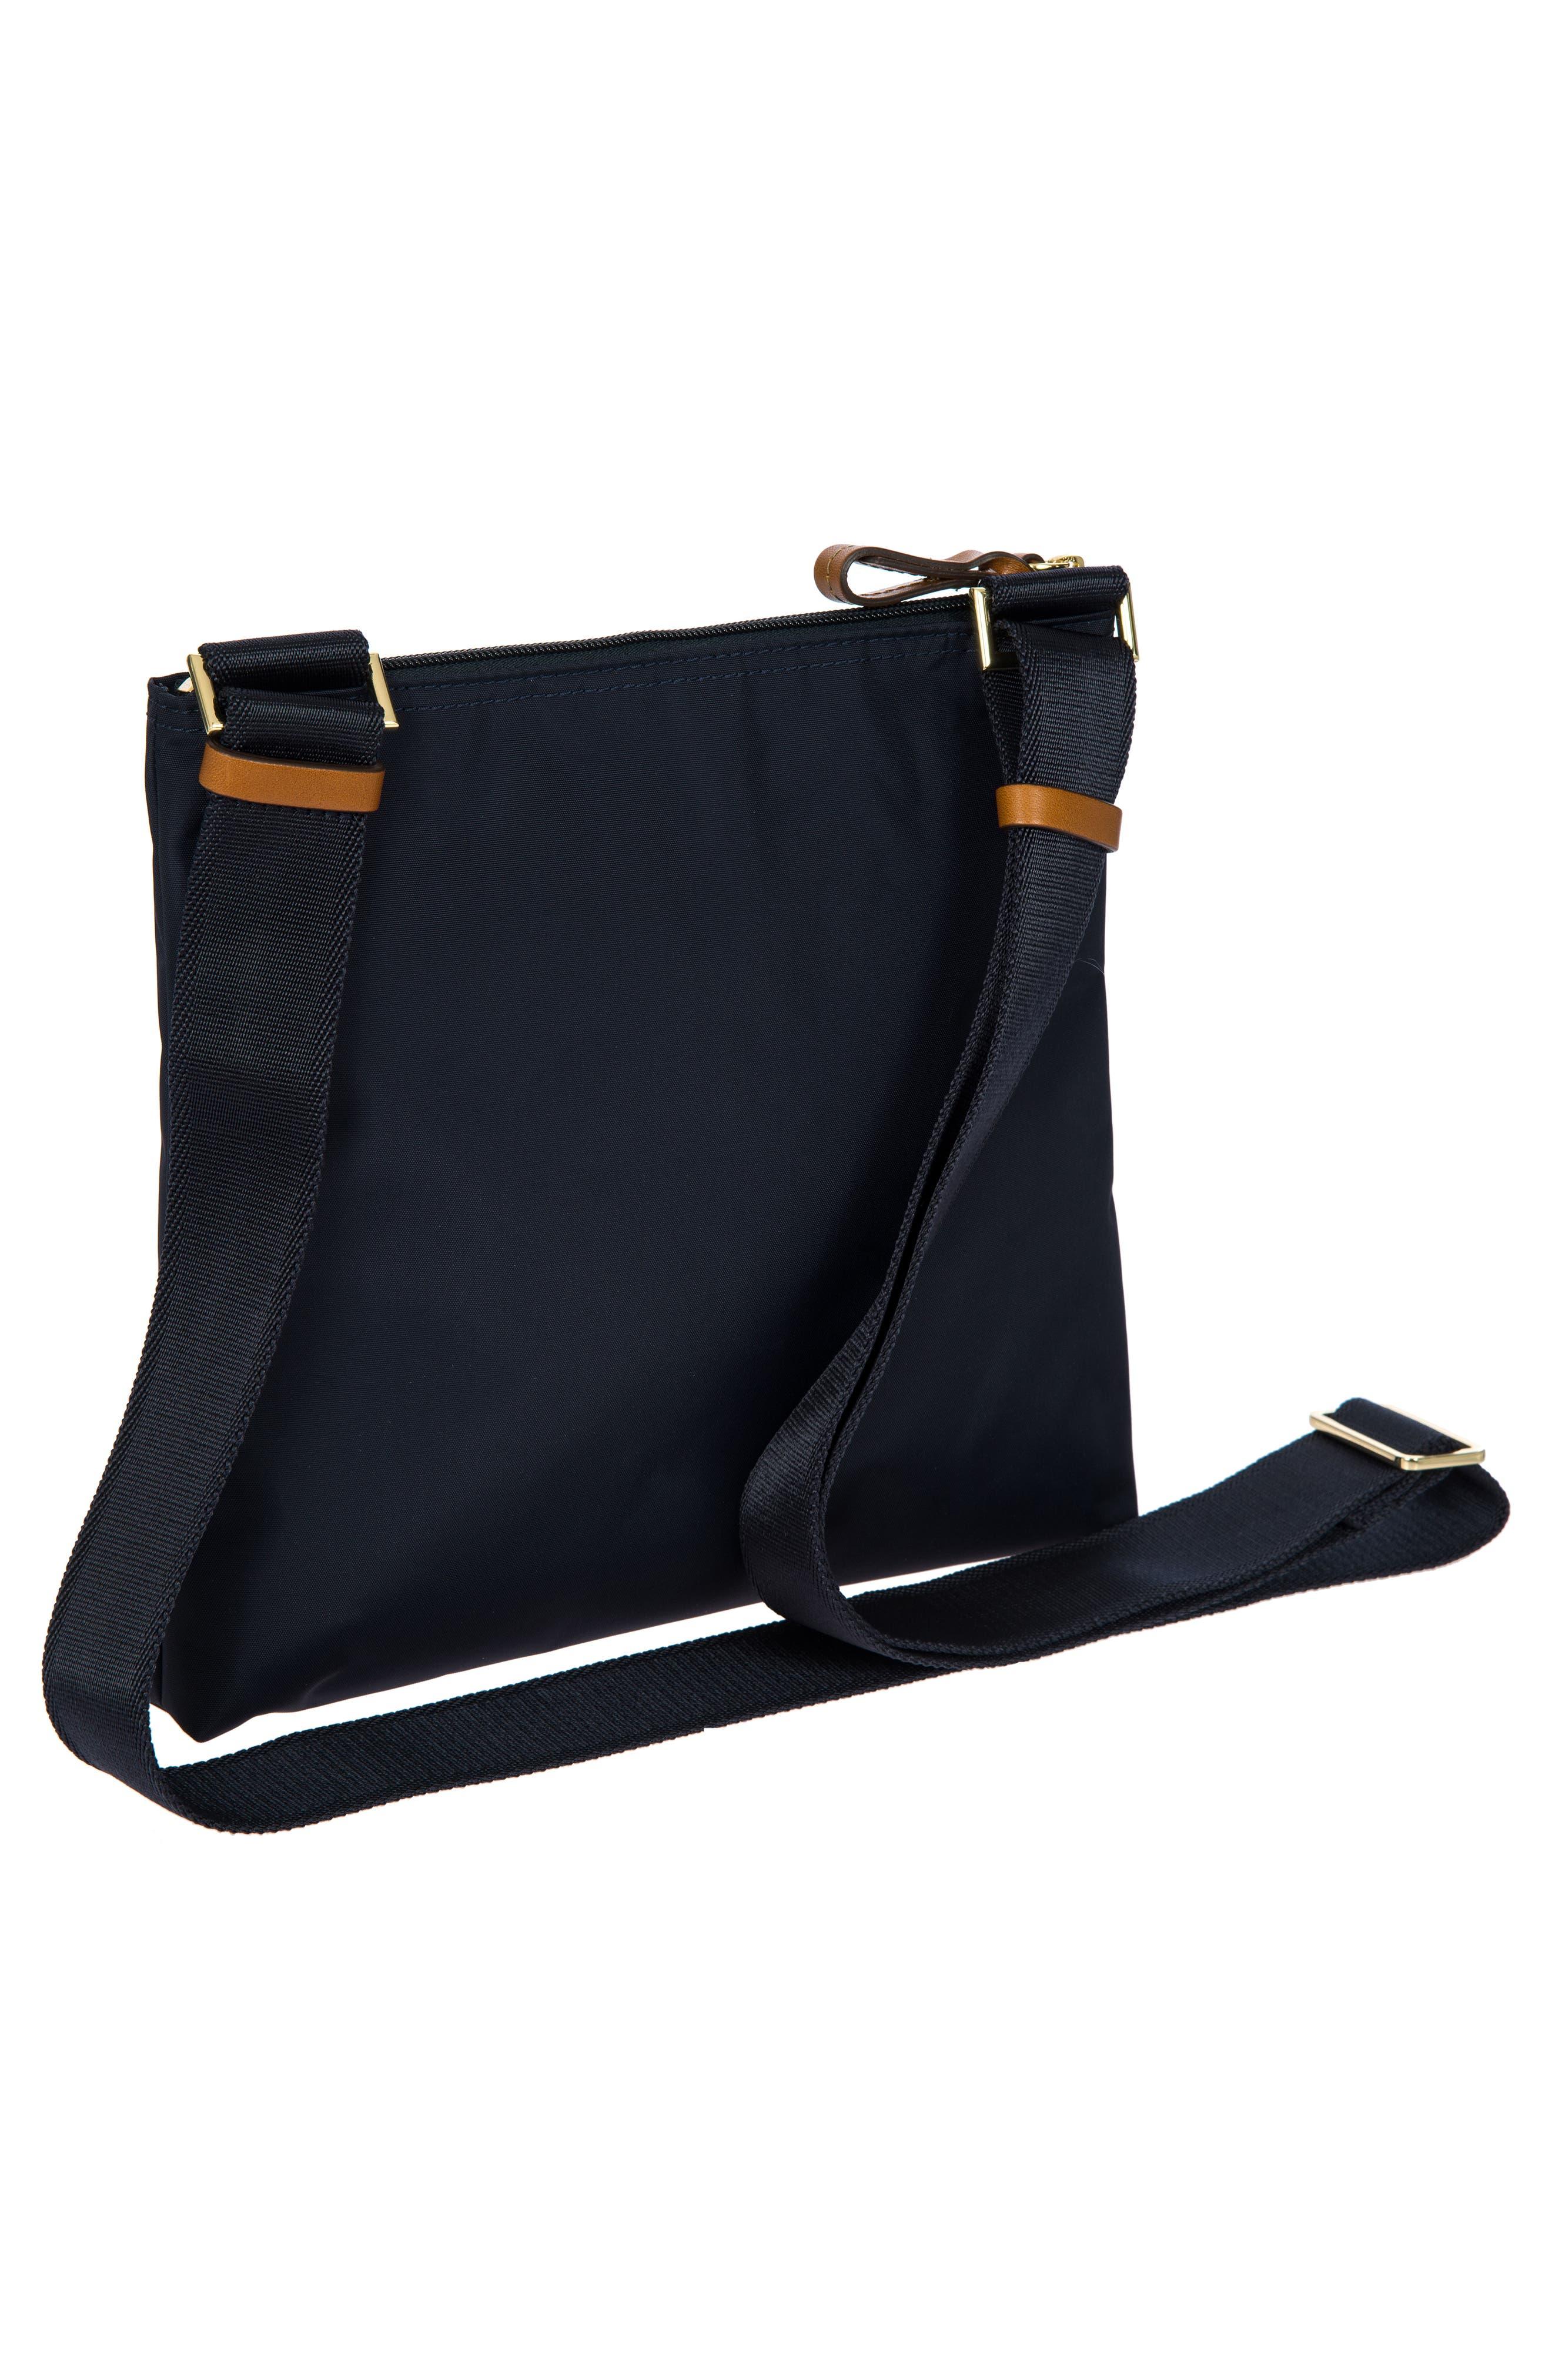 X-Bag Urban Crossbody Bag,                             Alternate thumbnail 2, color,                             Navy